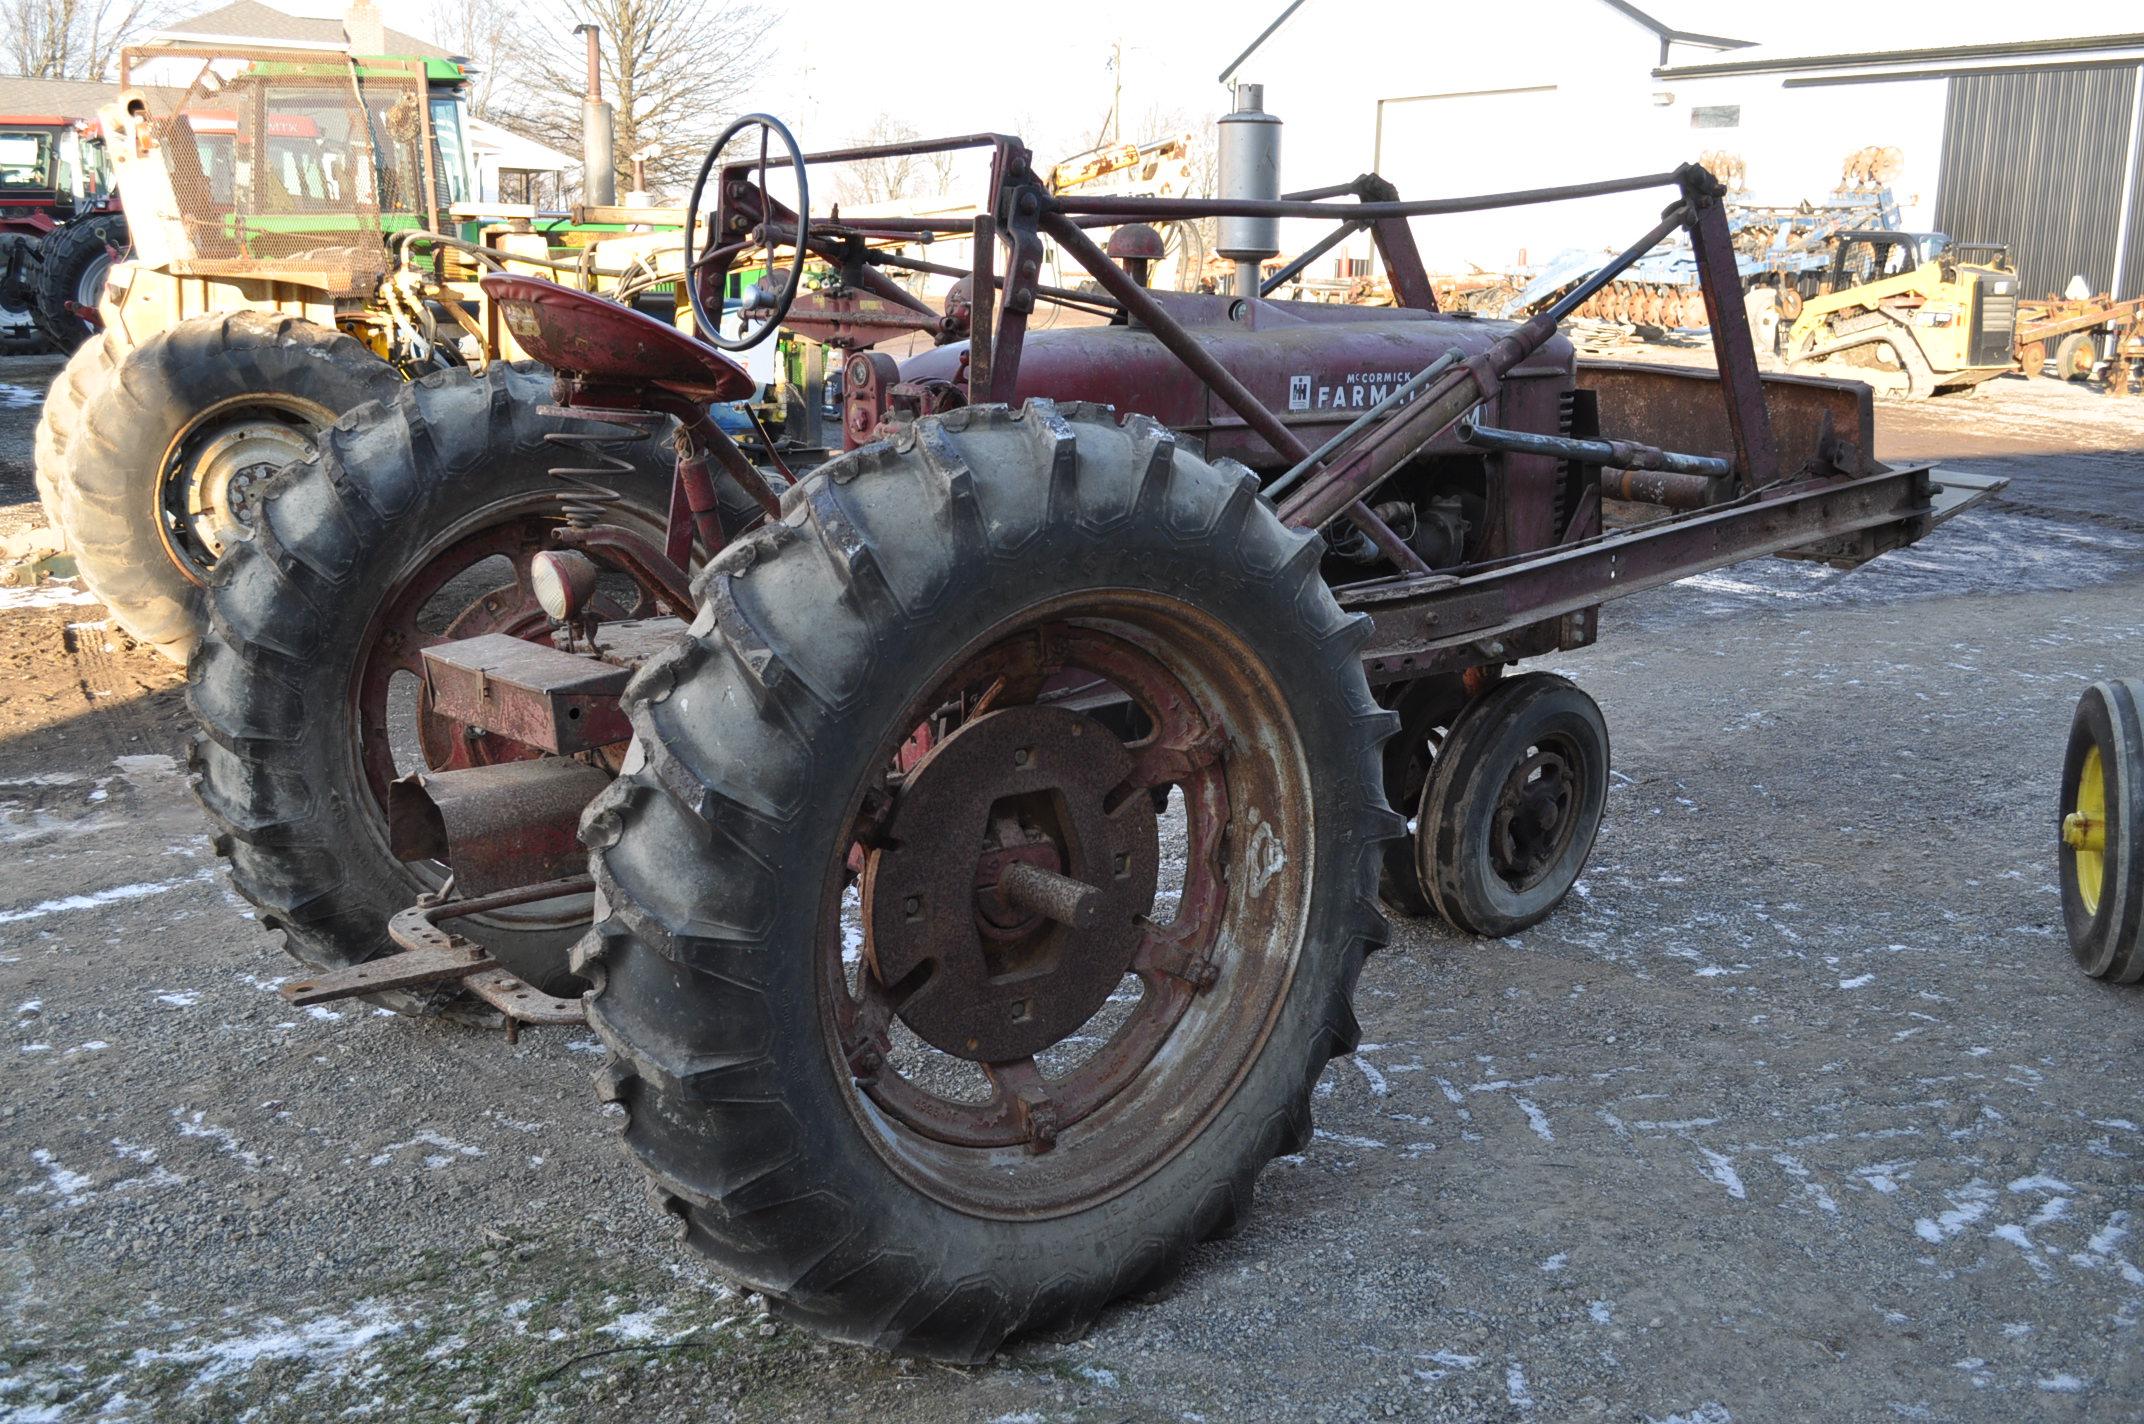 Farmall M tractor, 13.6-38 rear, narrow front, gasoline, loader, 540 PTO, SN FBK276 - Image 3 of 11